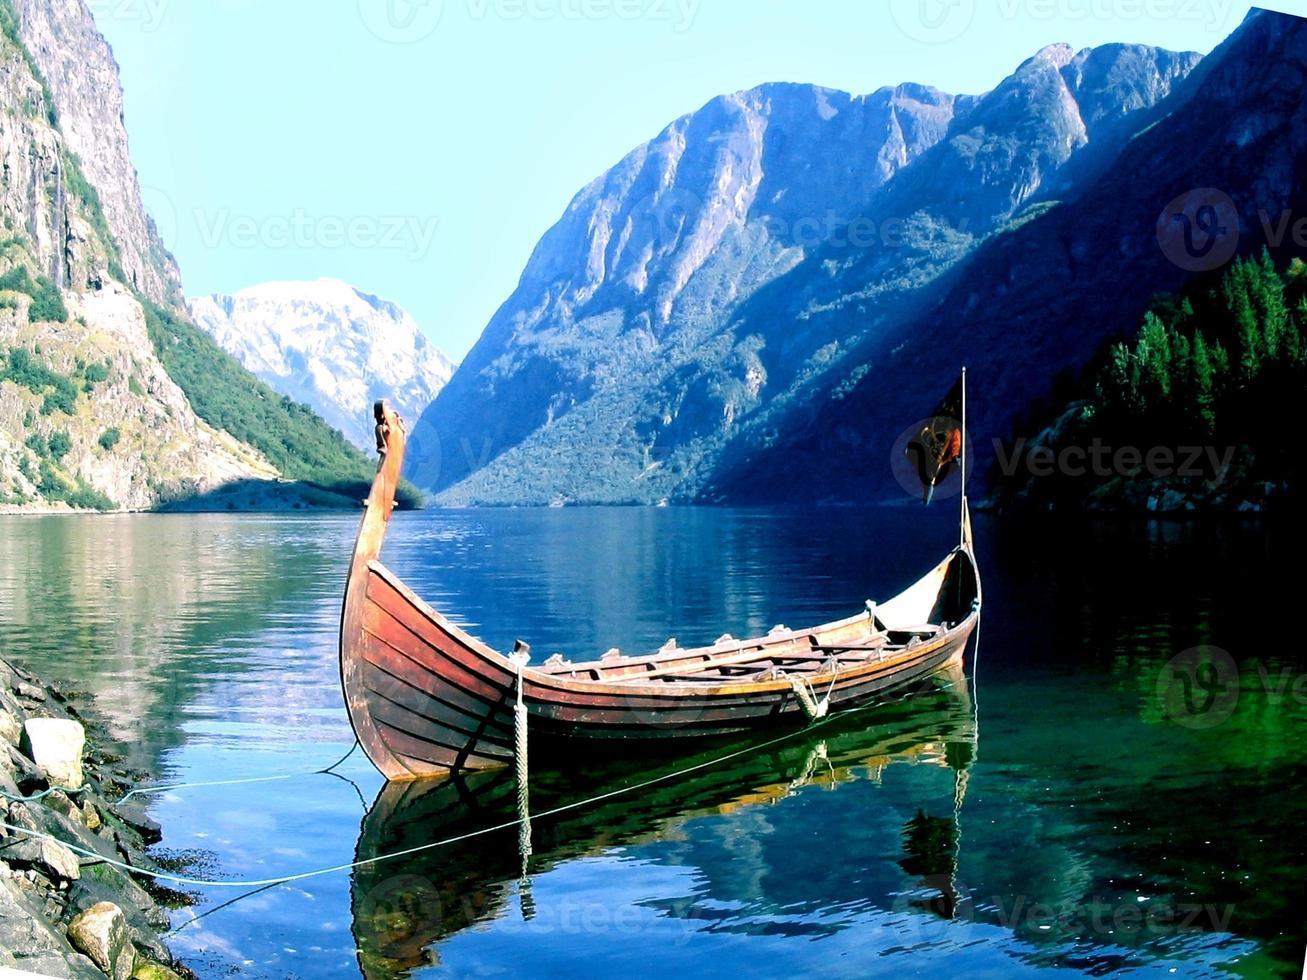 Vikingo foto